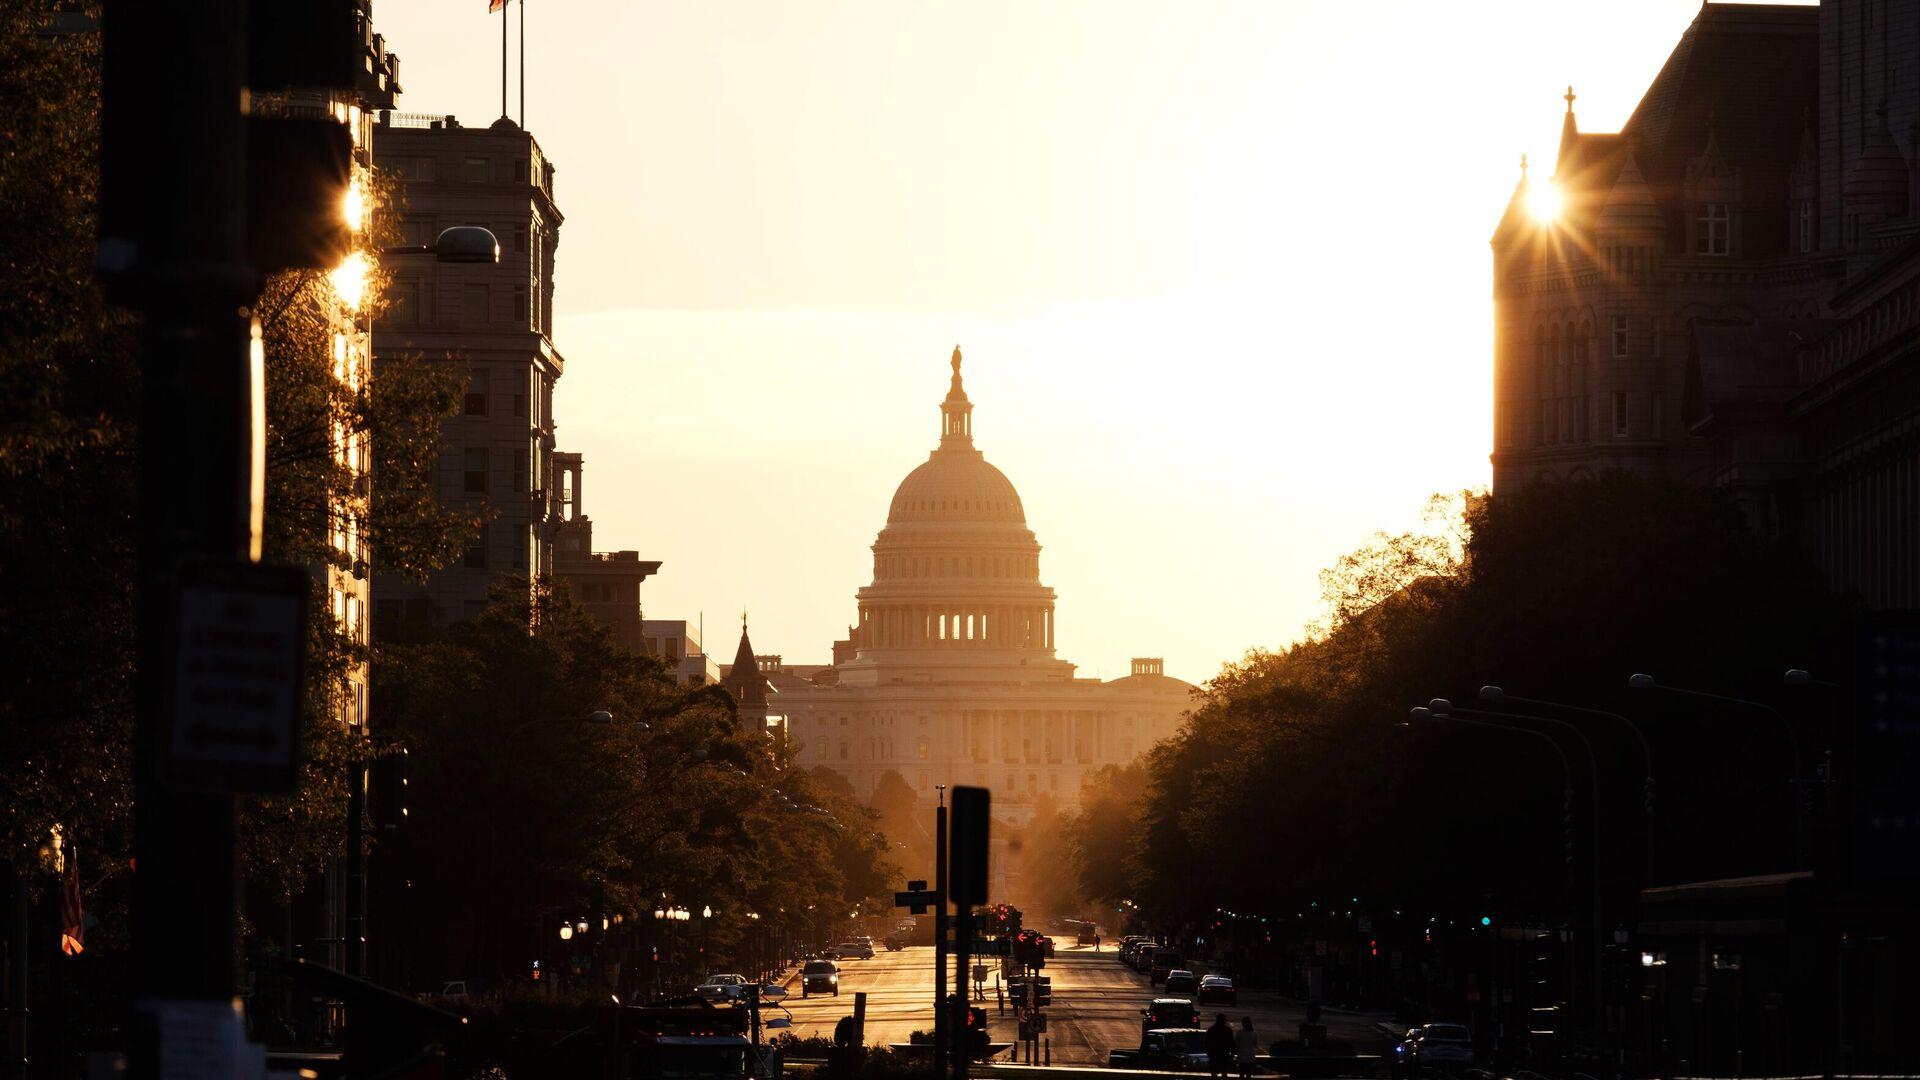 Здание Капитолия США в Вашингтоне - РИА Новости, 1920, 13.12.2020